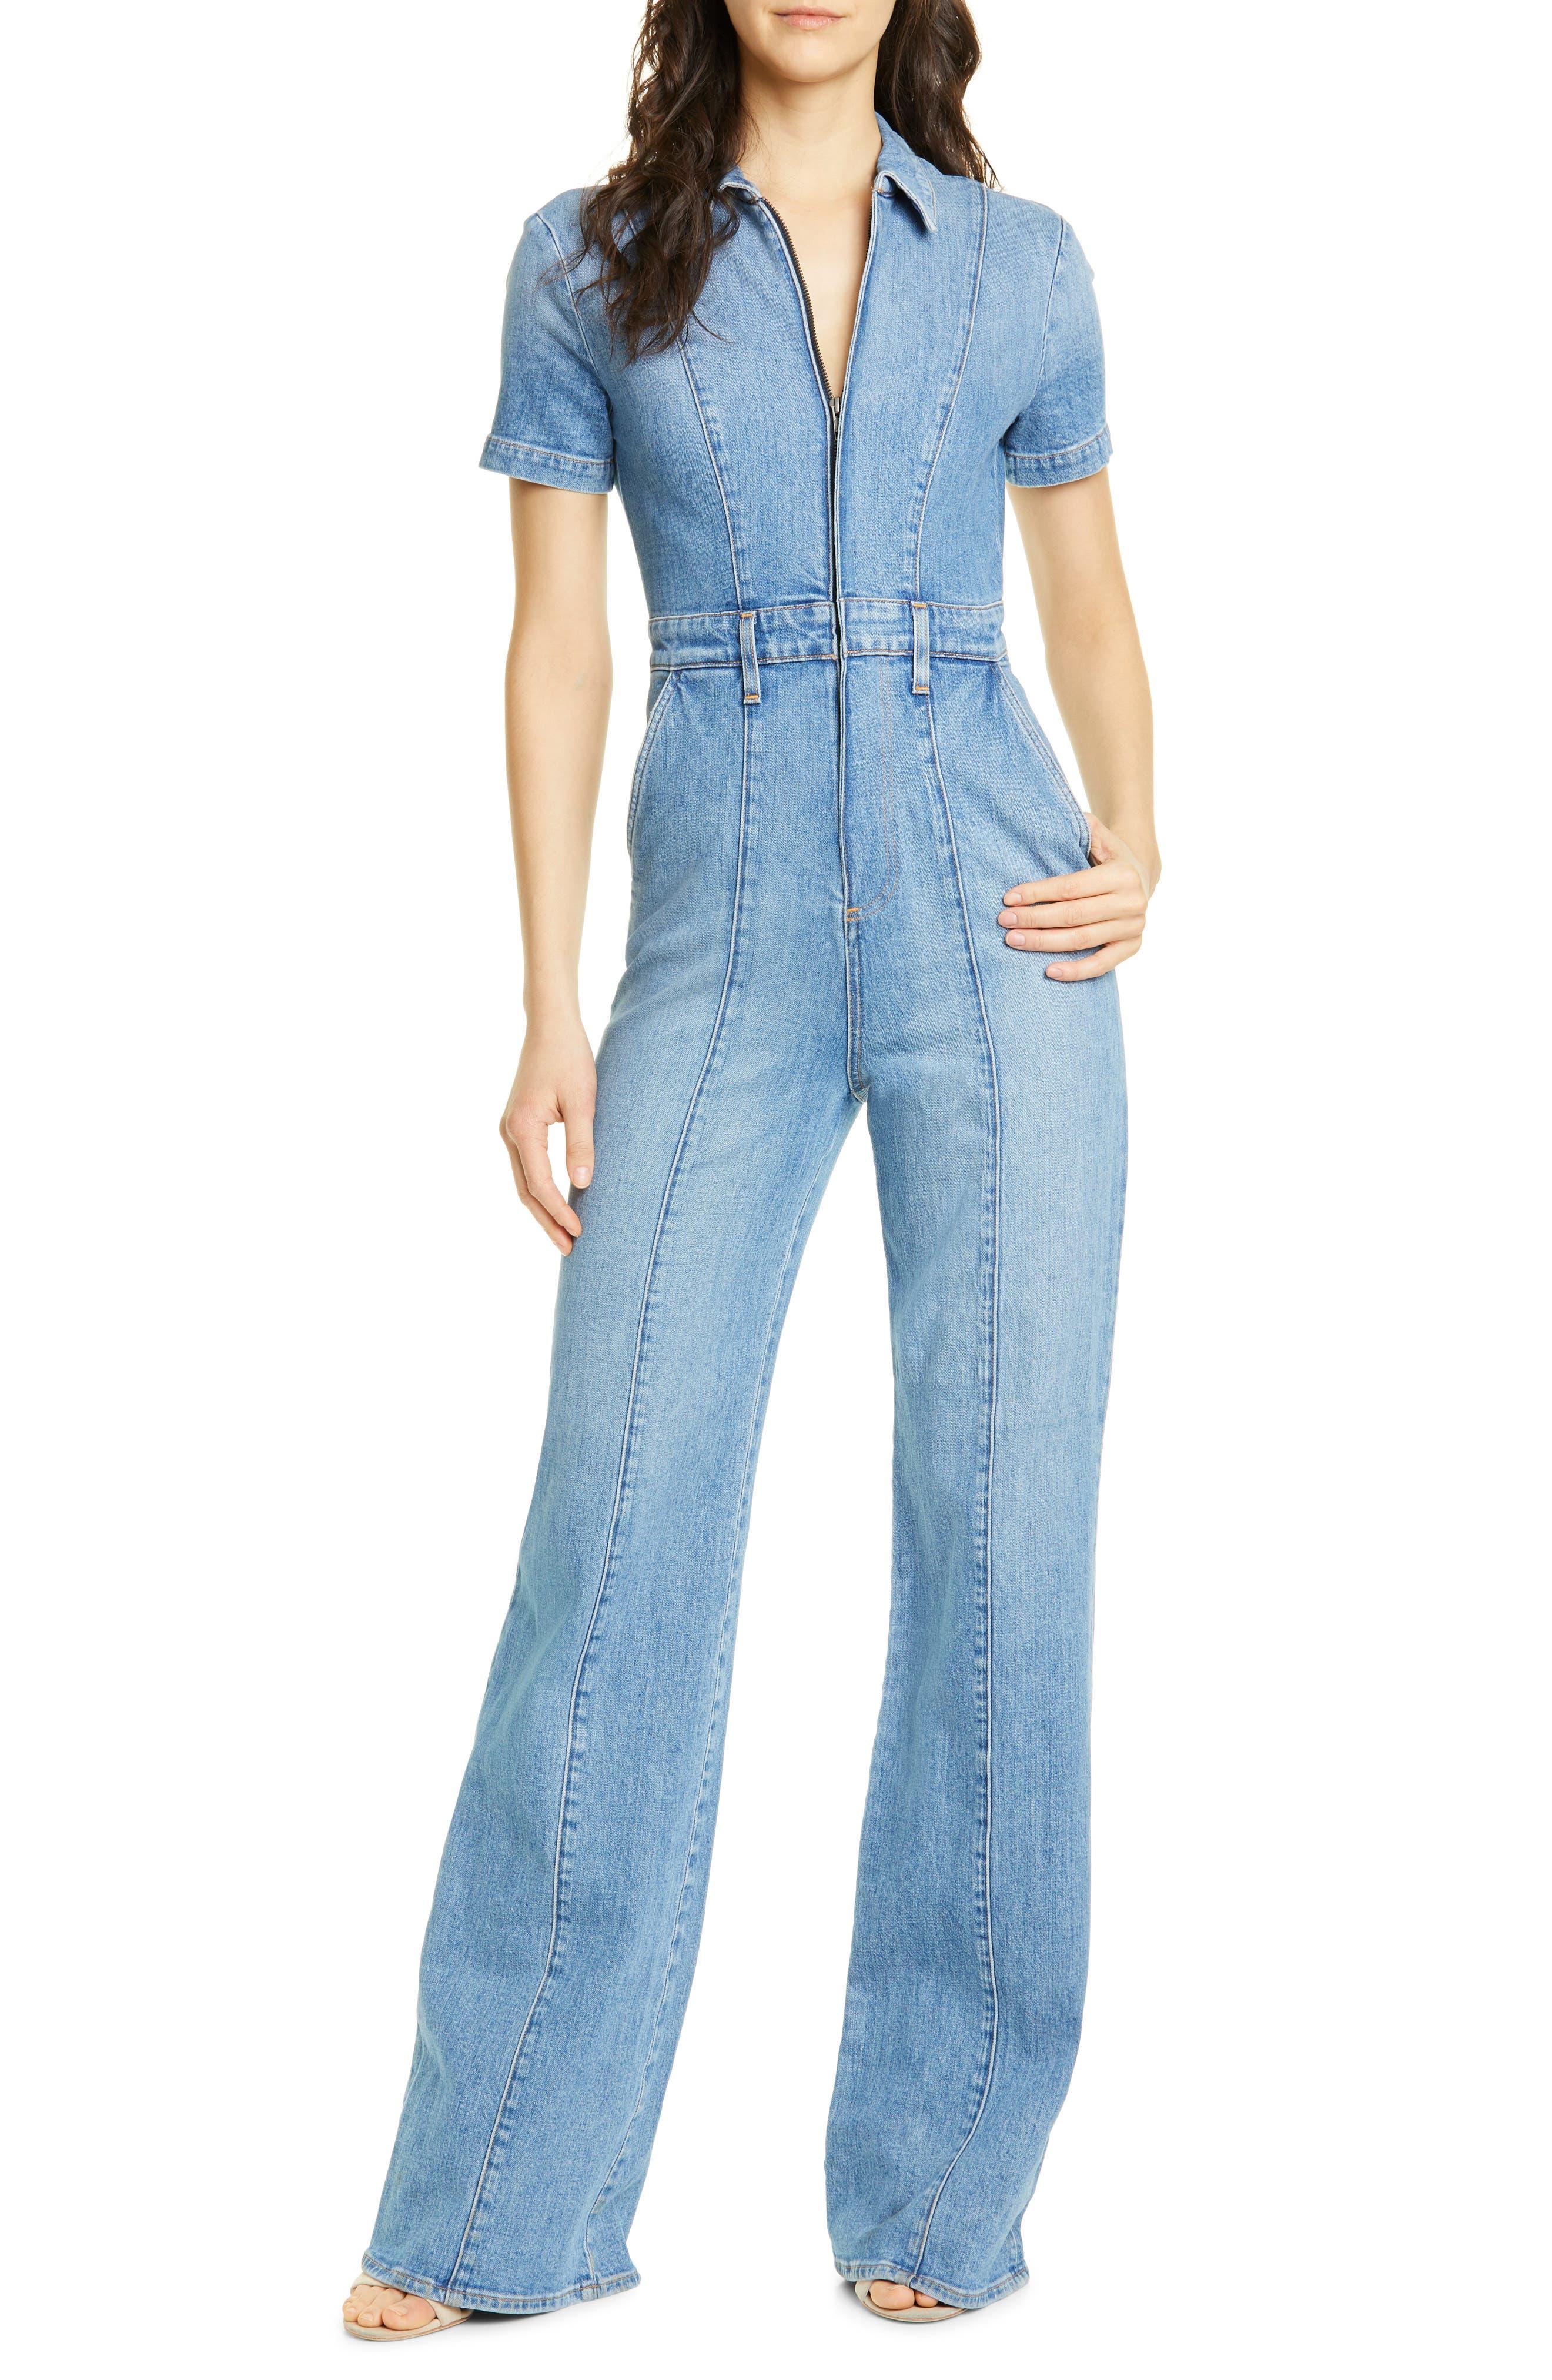 70s Jumpsuit   Disco Jumpsuits – Sequin, Striped, Gold, White, Black Womens Alice  Olivia Jeans Wide Leg Denim Jumpsuit $296.98 AT vintagedancer.com